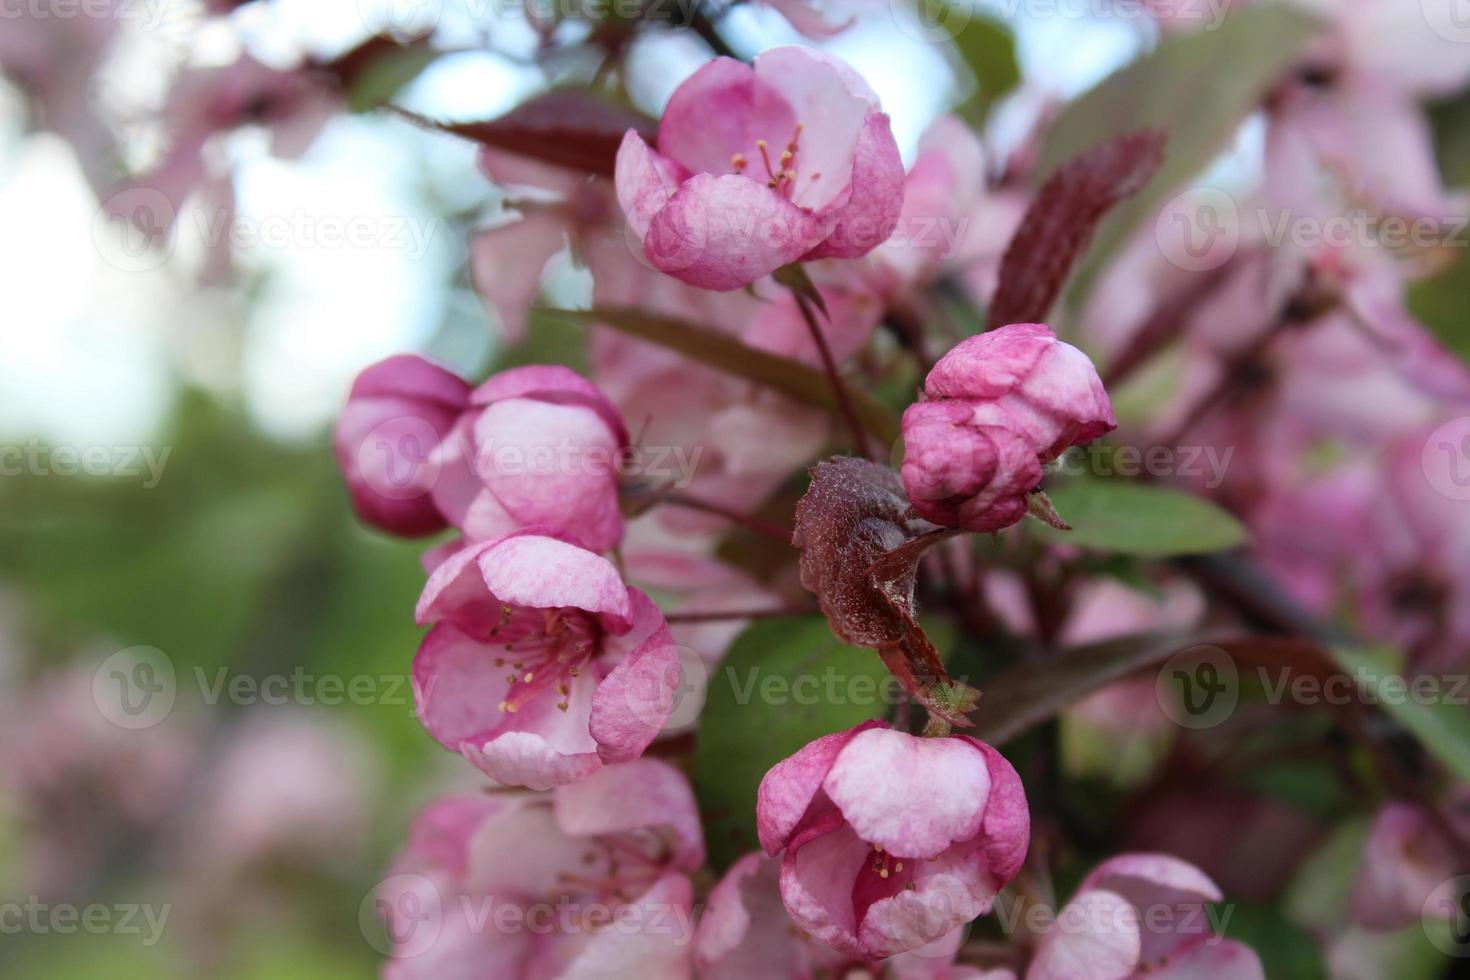 boutons de fleurs de cerisier roses. sakura photo